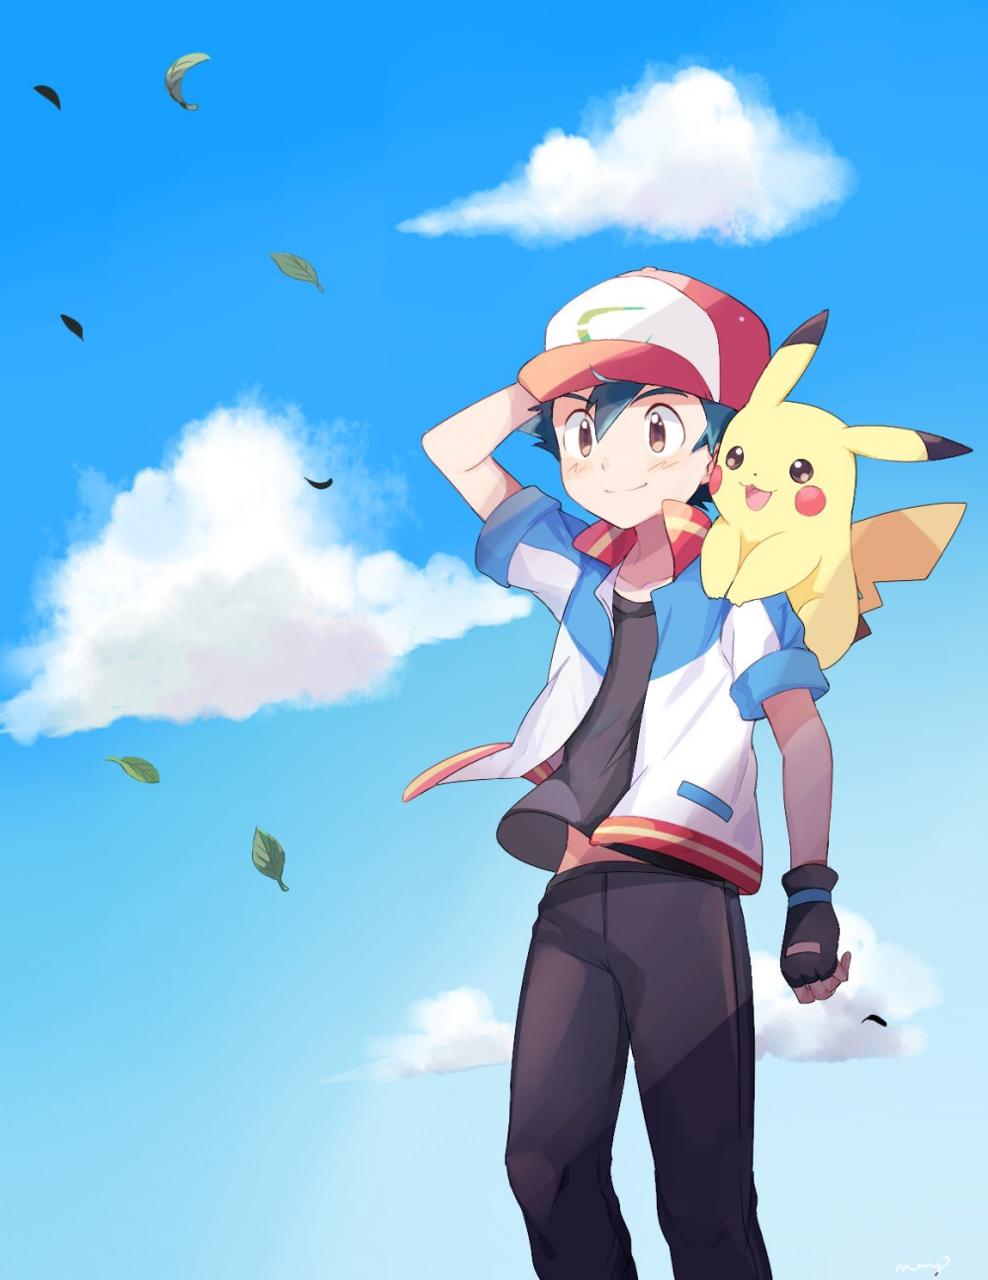 Pin By Amazinggracidea On Pokemon Eeveelutions In 2020 Pokemon